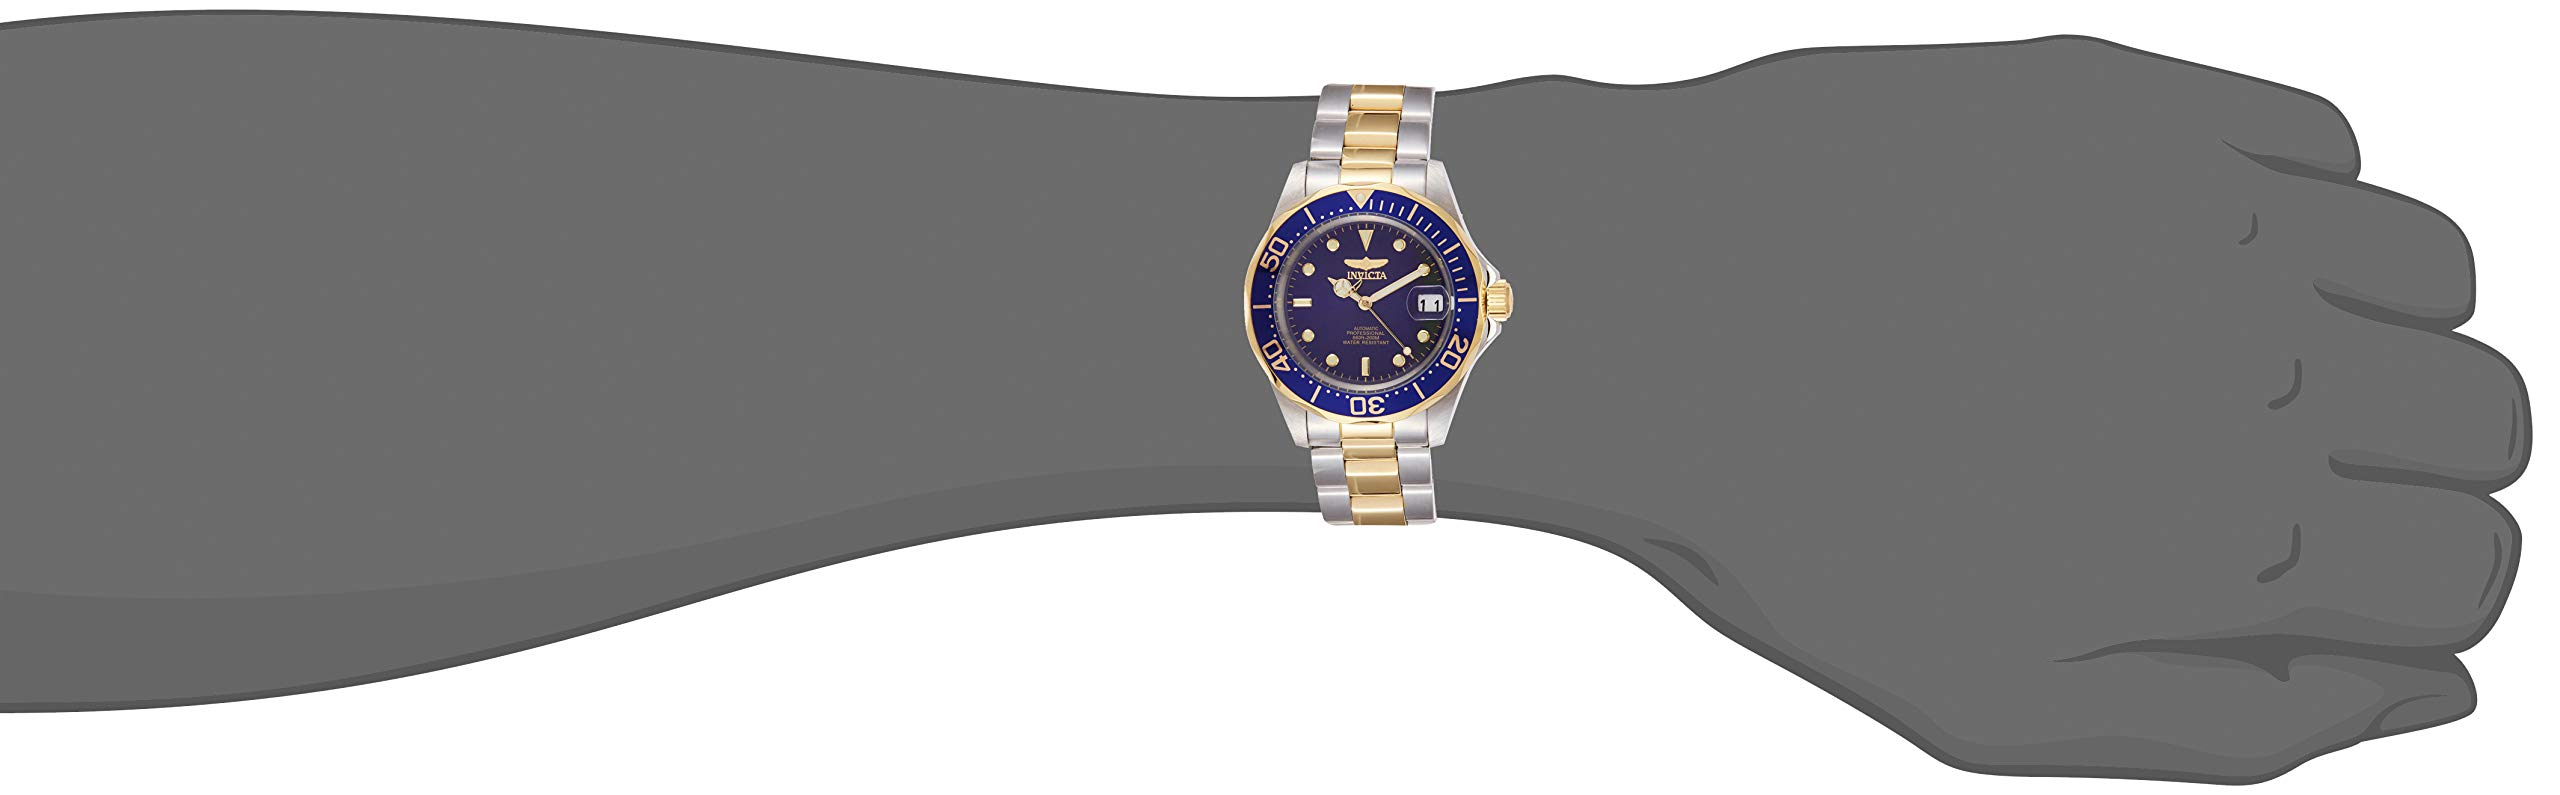 Invicta 8928 Pro Diver Reloj Unisex acero inoxidable Automático Esfera